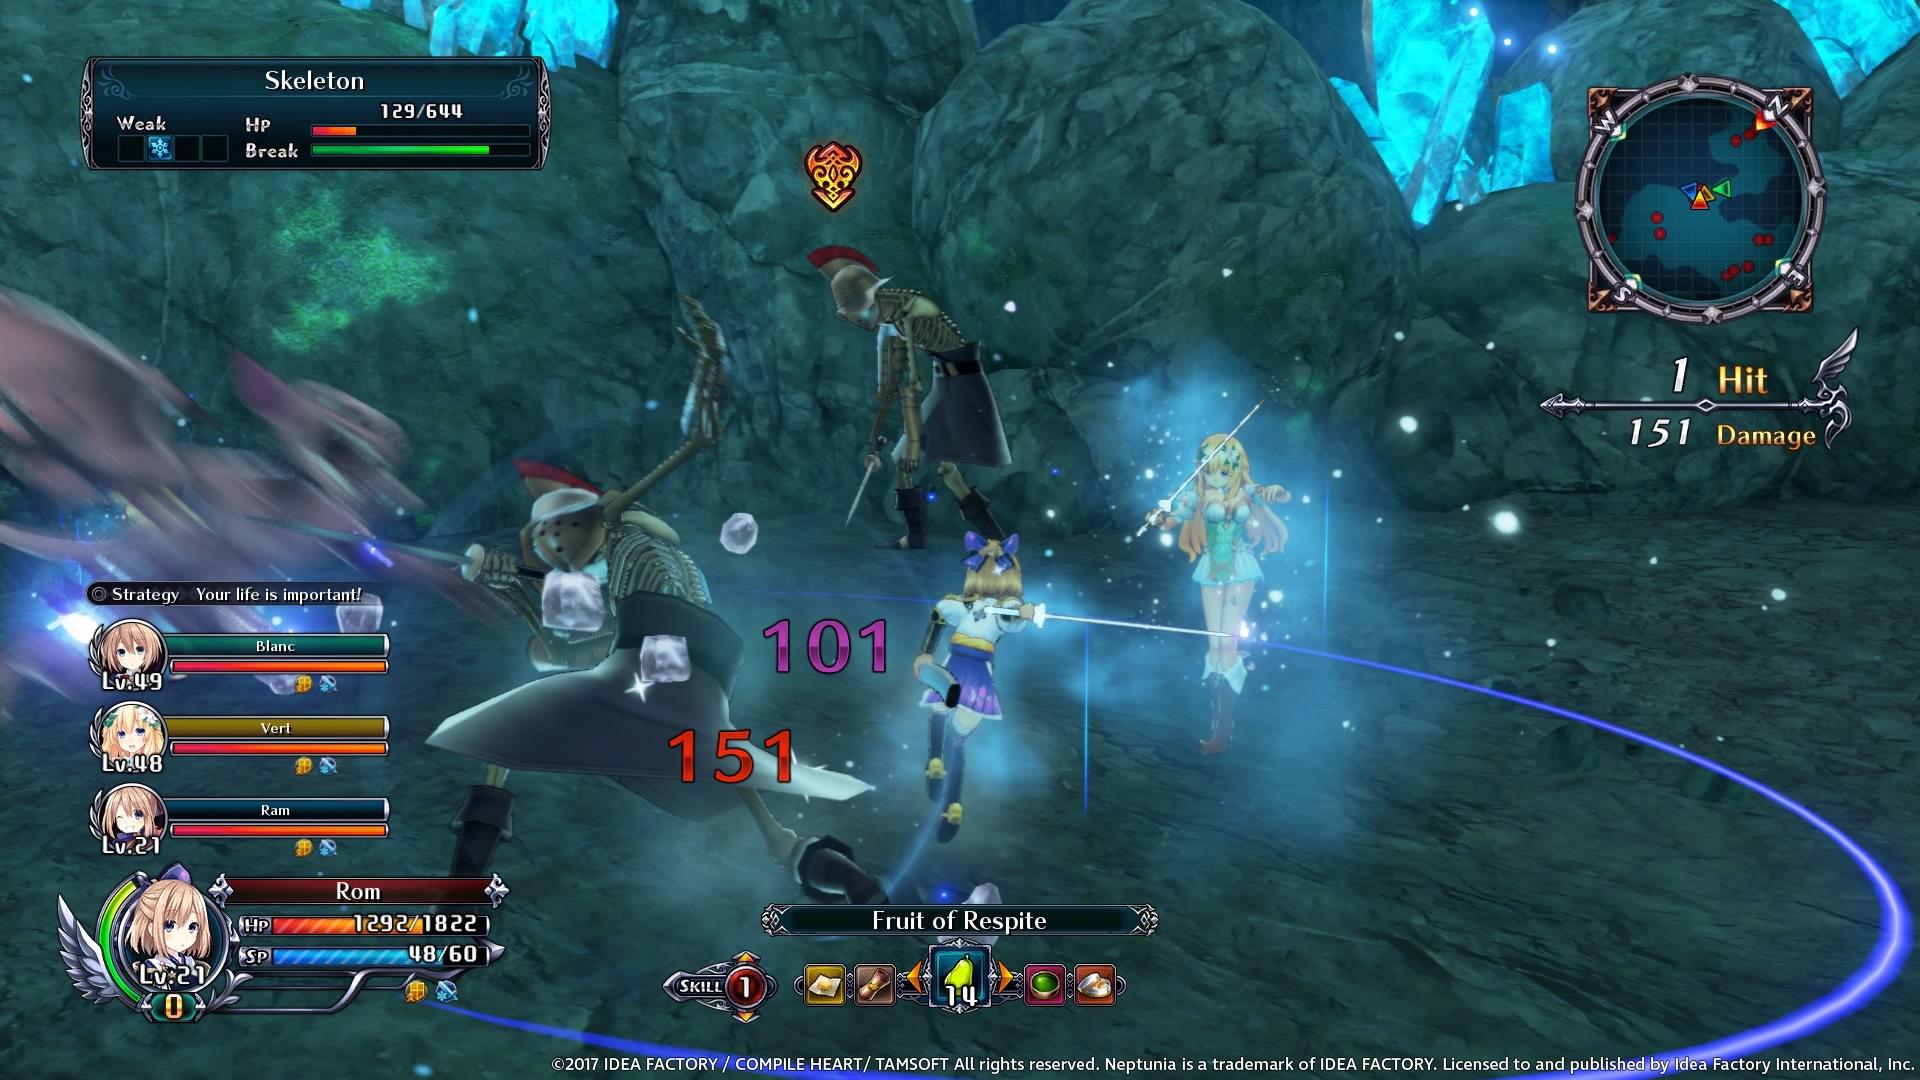 Onlineovka Cyberdimension Neptunia: 4 Goddesses Online nakonec vyjde už v půlce října 148382